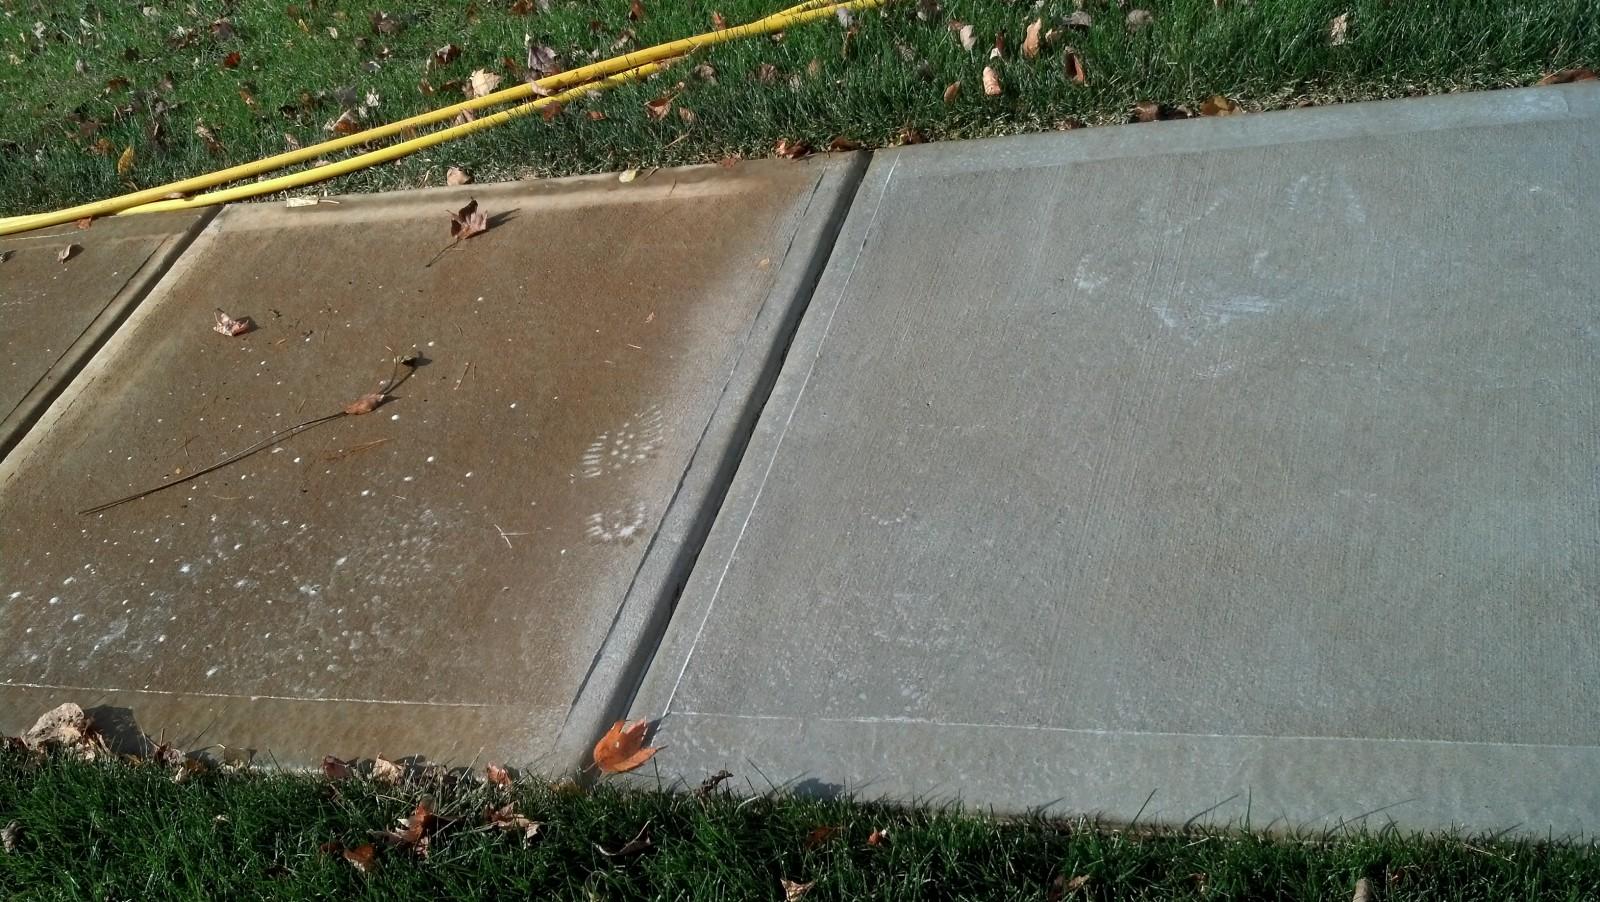 Concrete power washing nj pressure washing concrete nj for Cement pressure washer